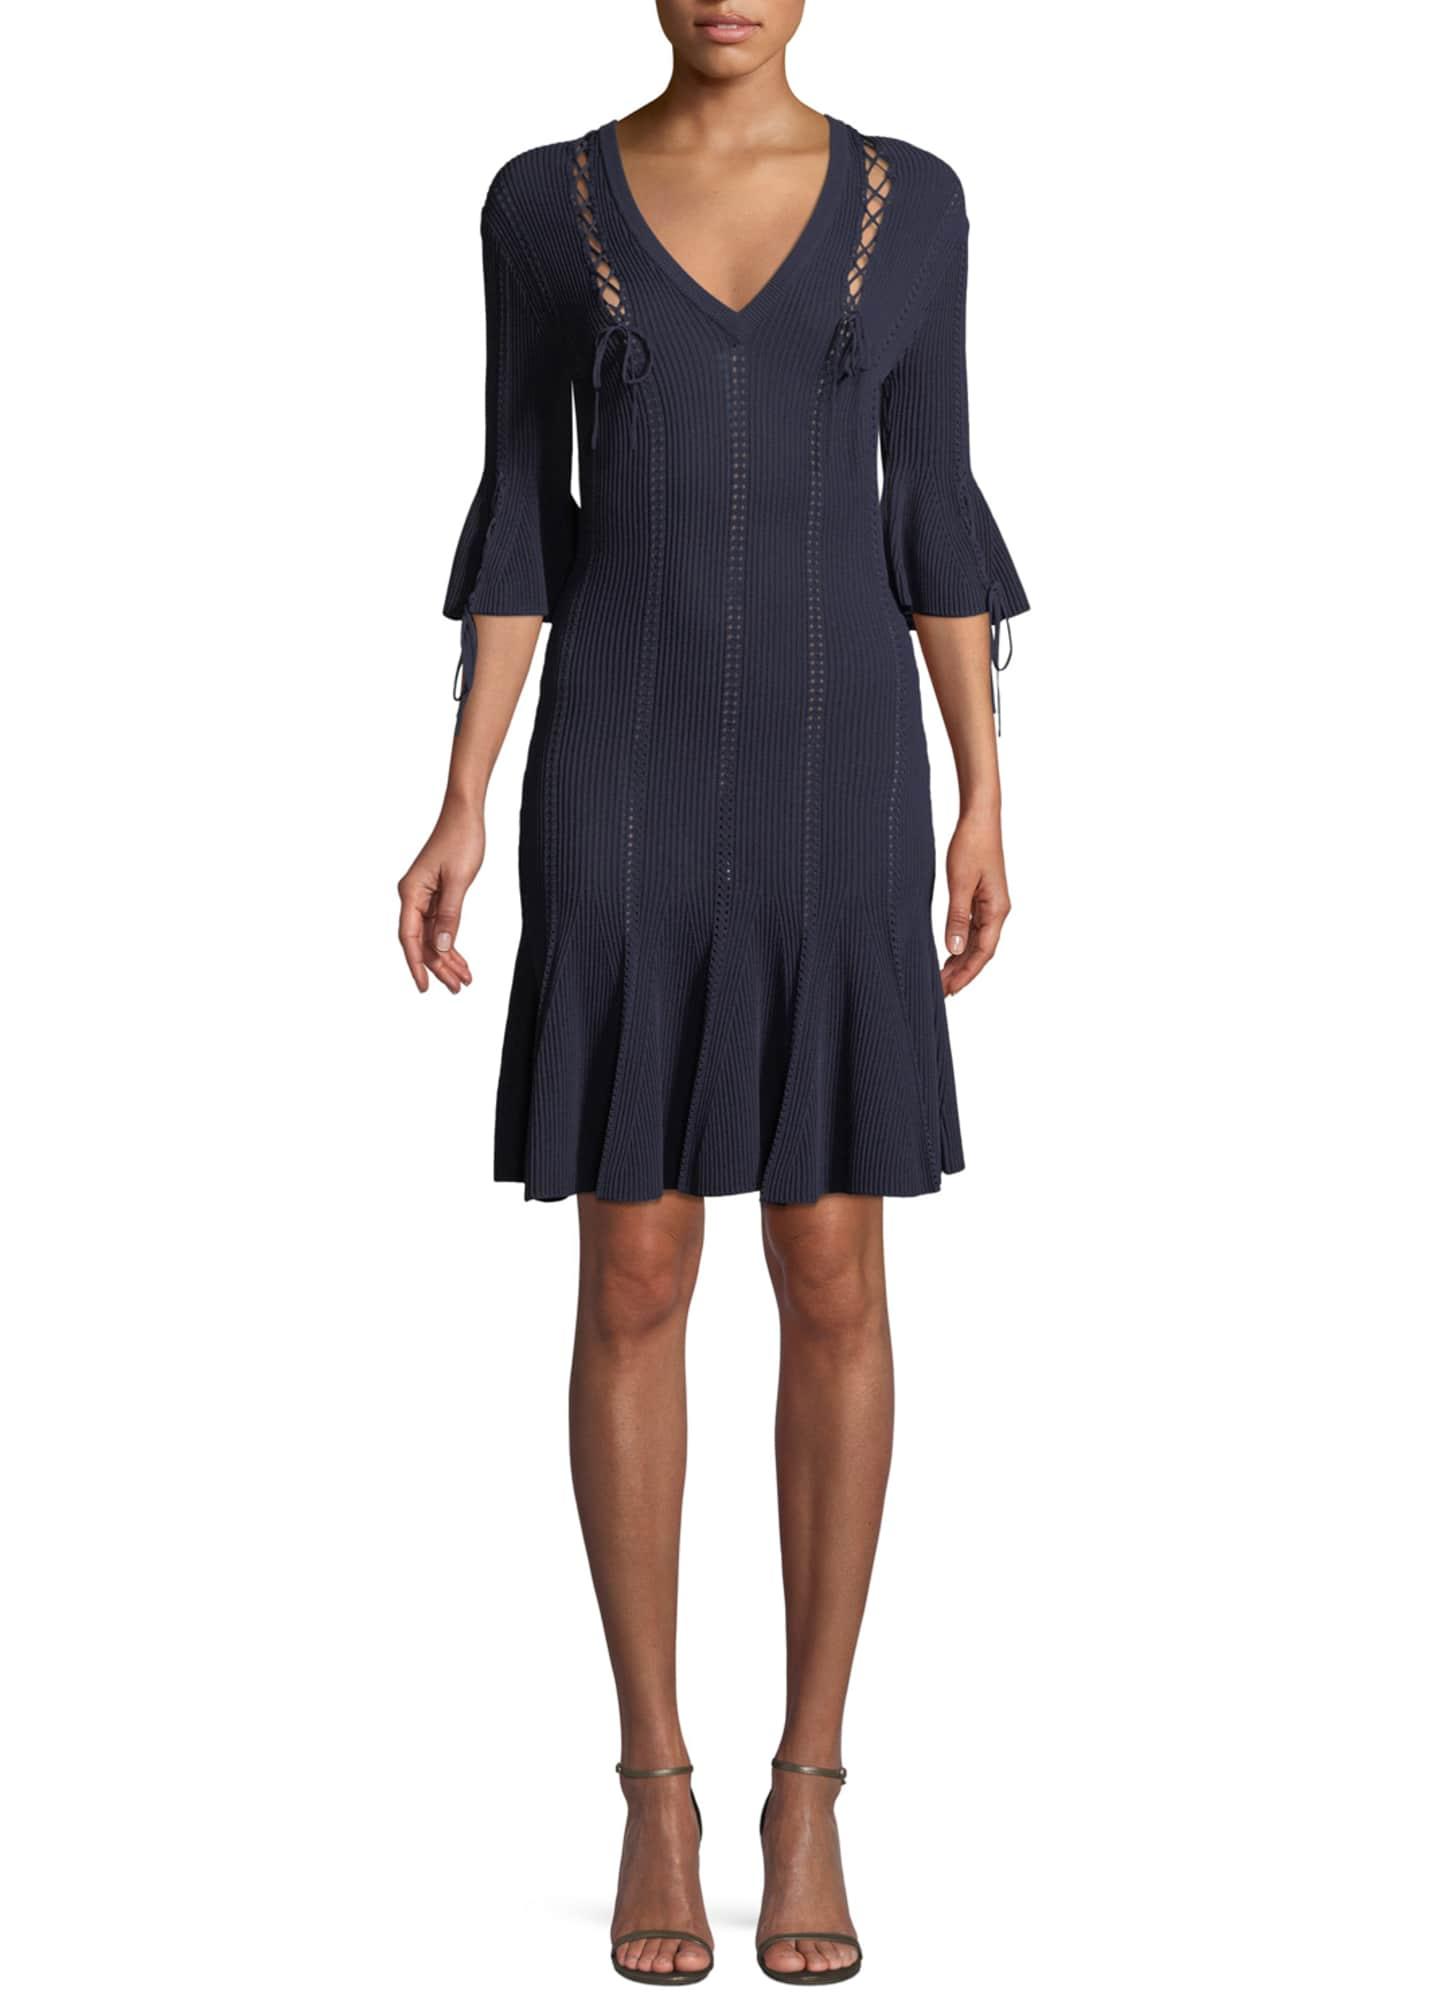 Jonathan Simkhai V-Neck Linked Rib-Knit Dress w/ Lace-Up